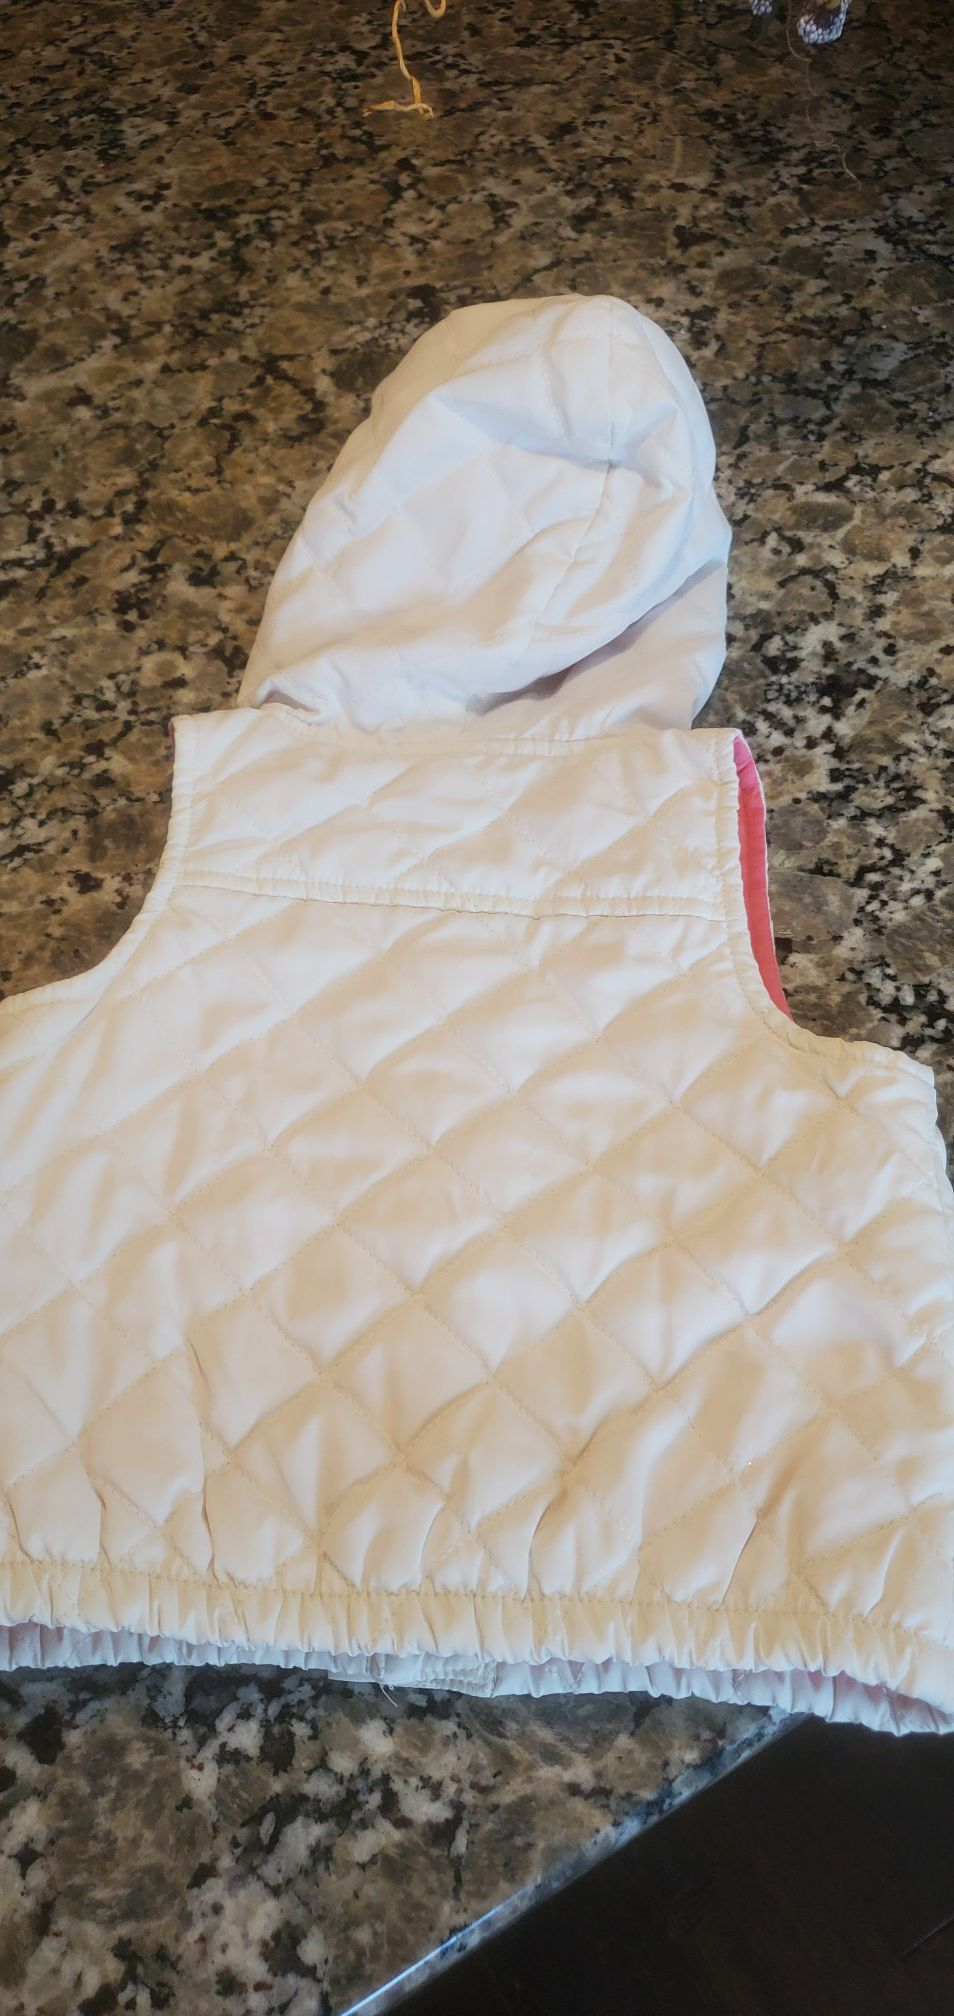 Oshkosh Pink/Cream Vest - 12 Months Baby